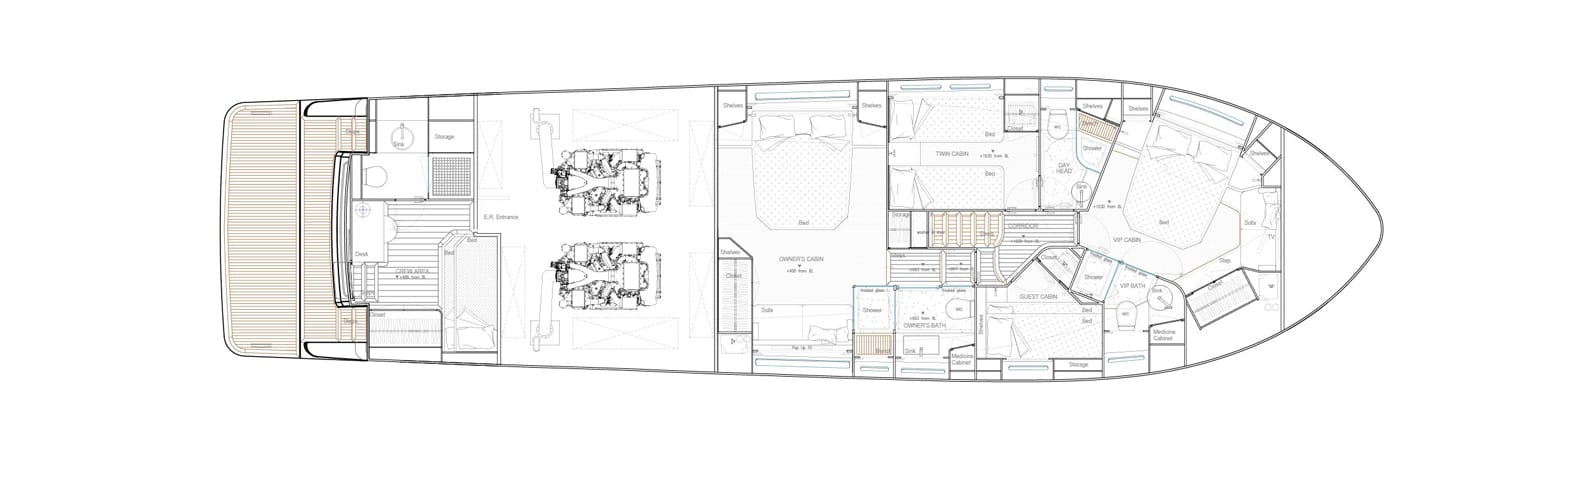 Uniesse-Capri-6-footprint4-rooms4